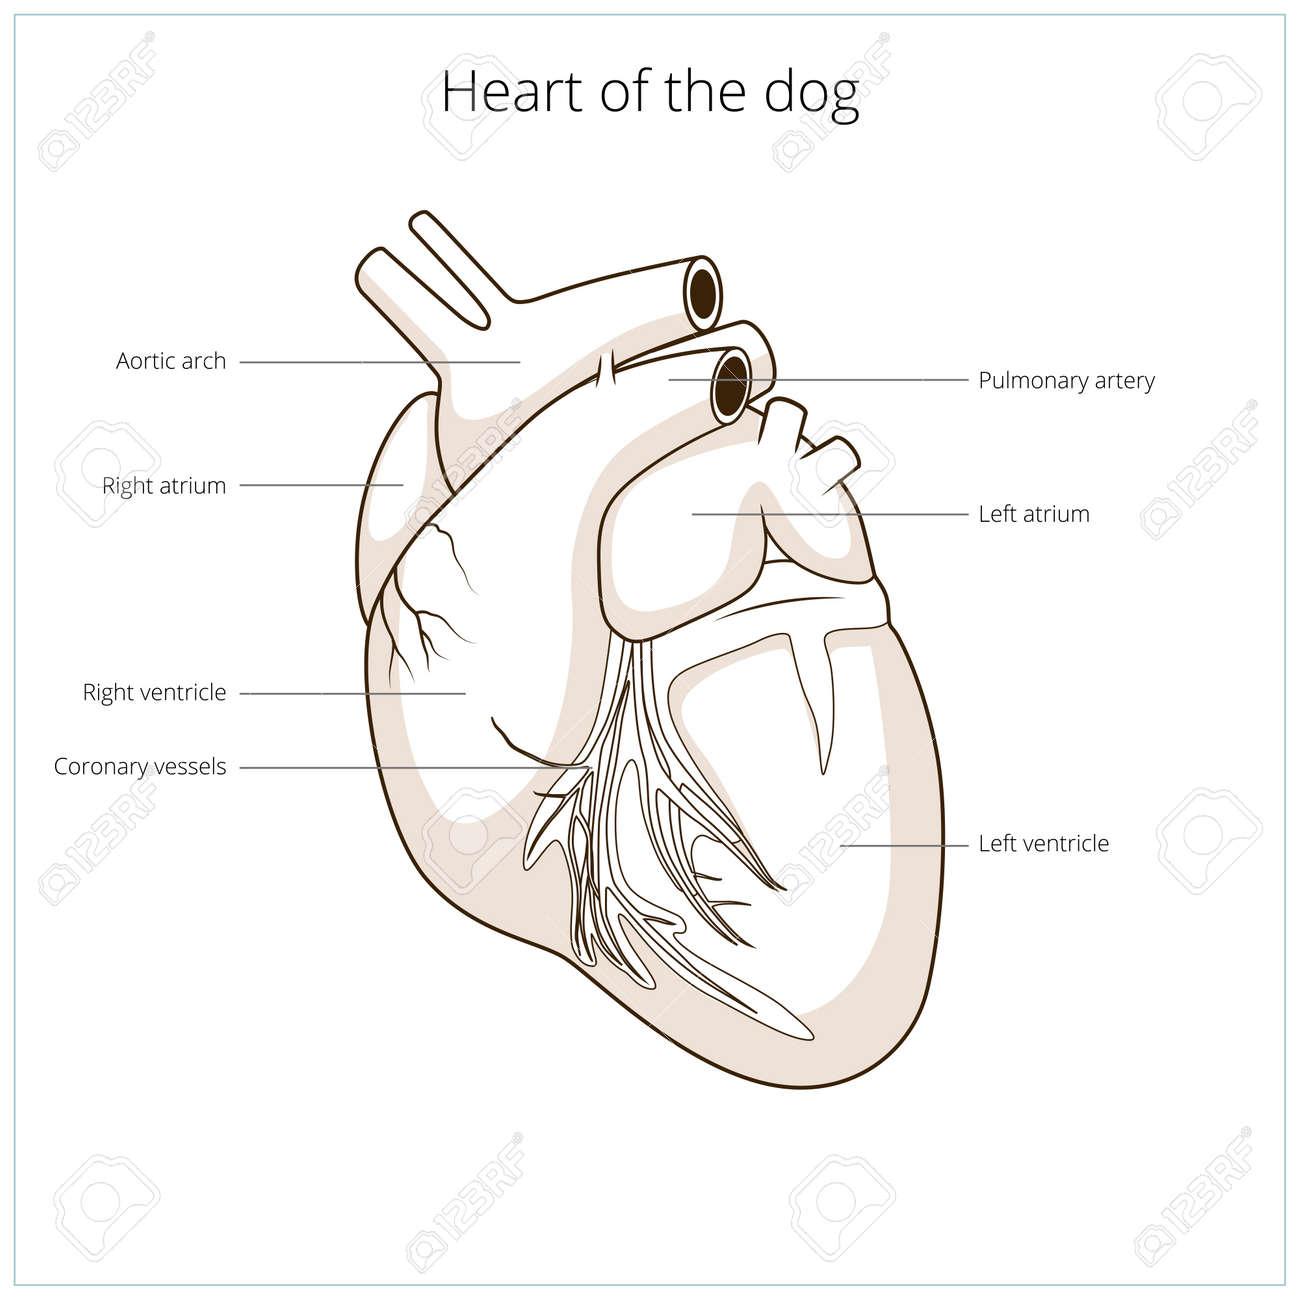 hight resolution of dermatology dog diagram wiring diagram data dog body diagram dermatology